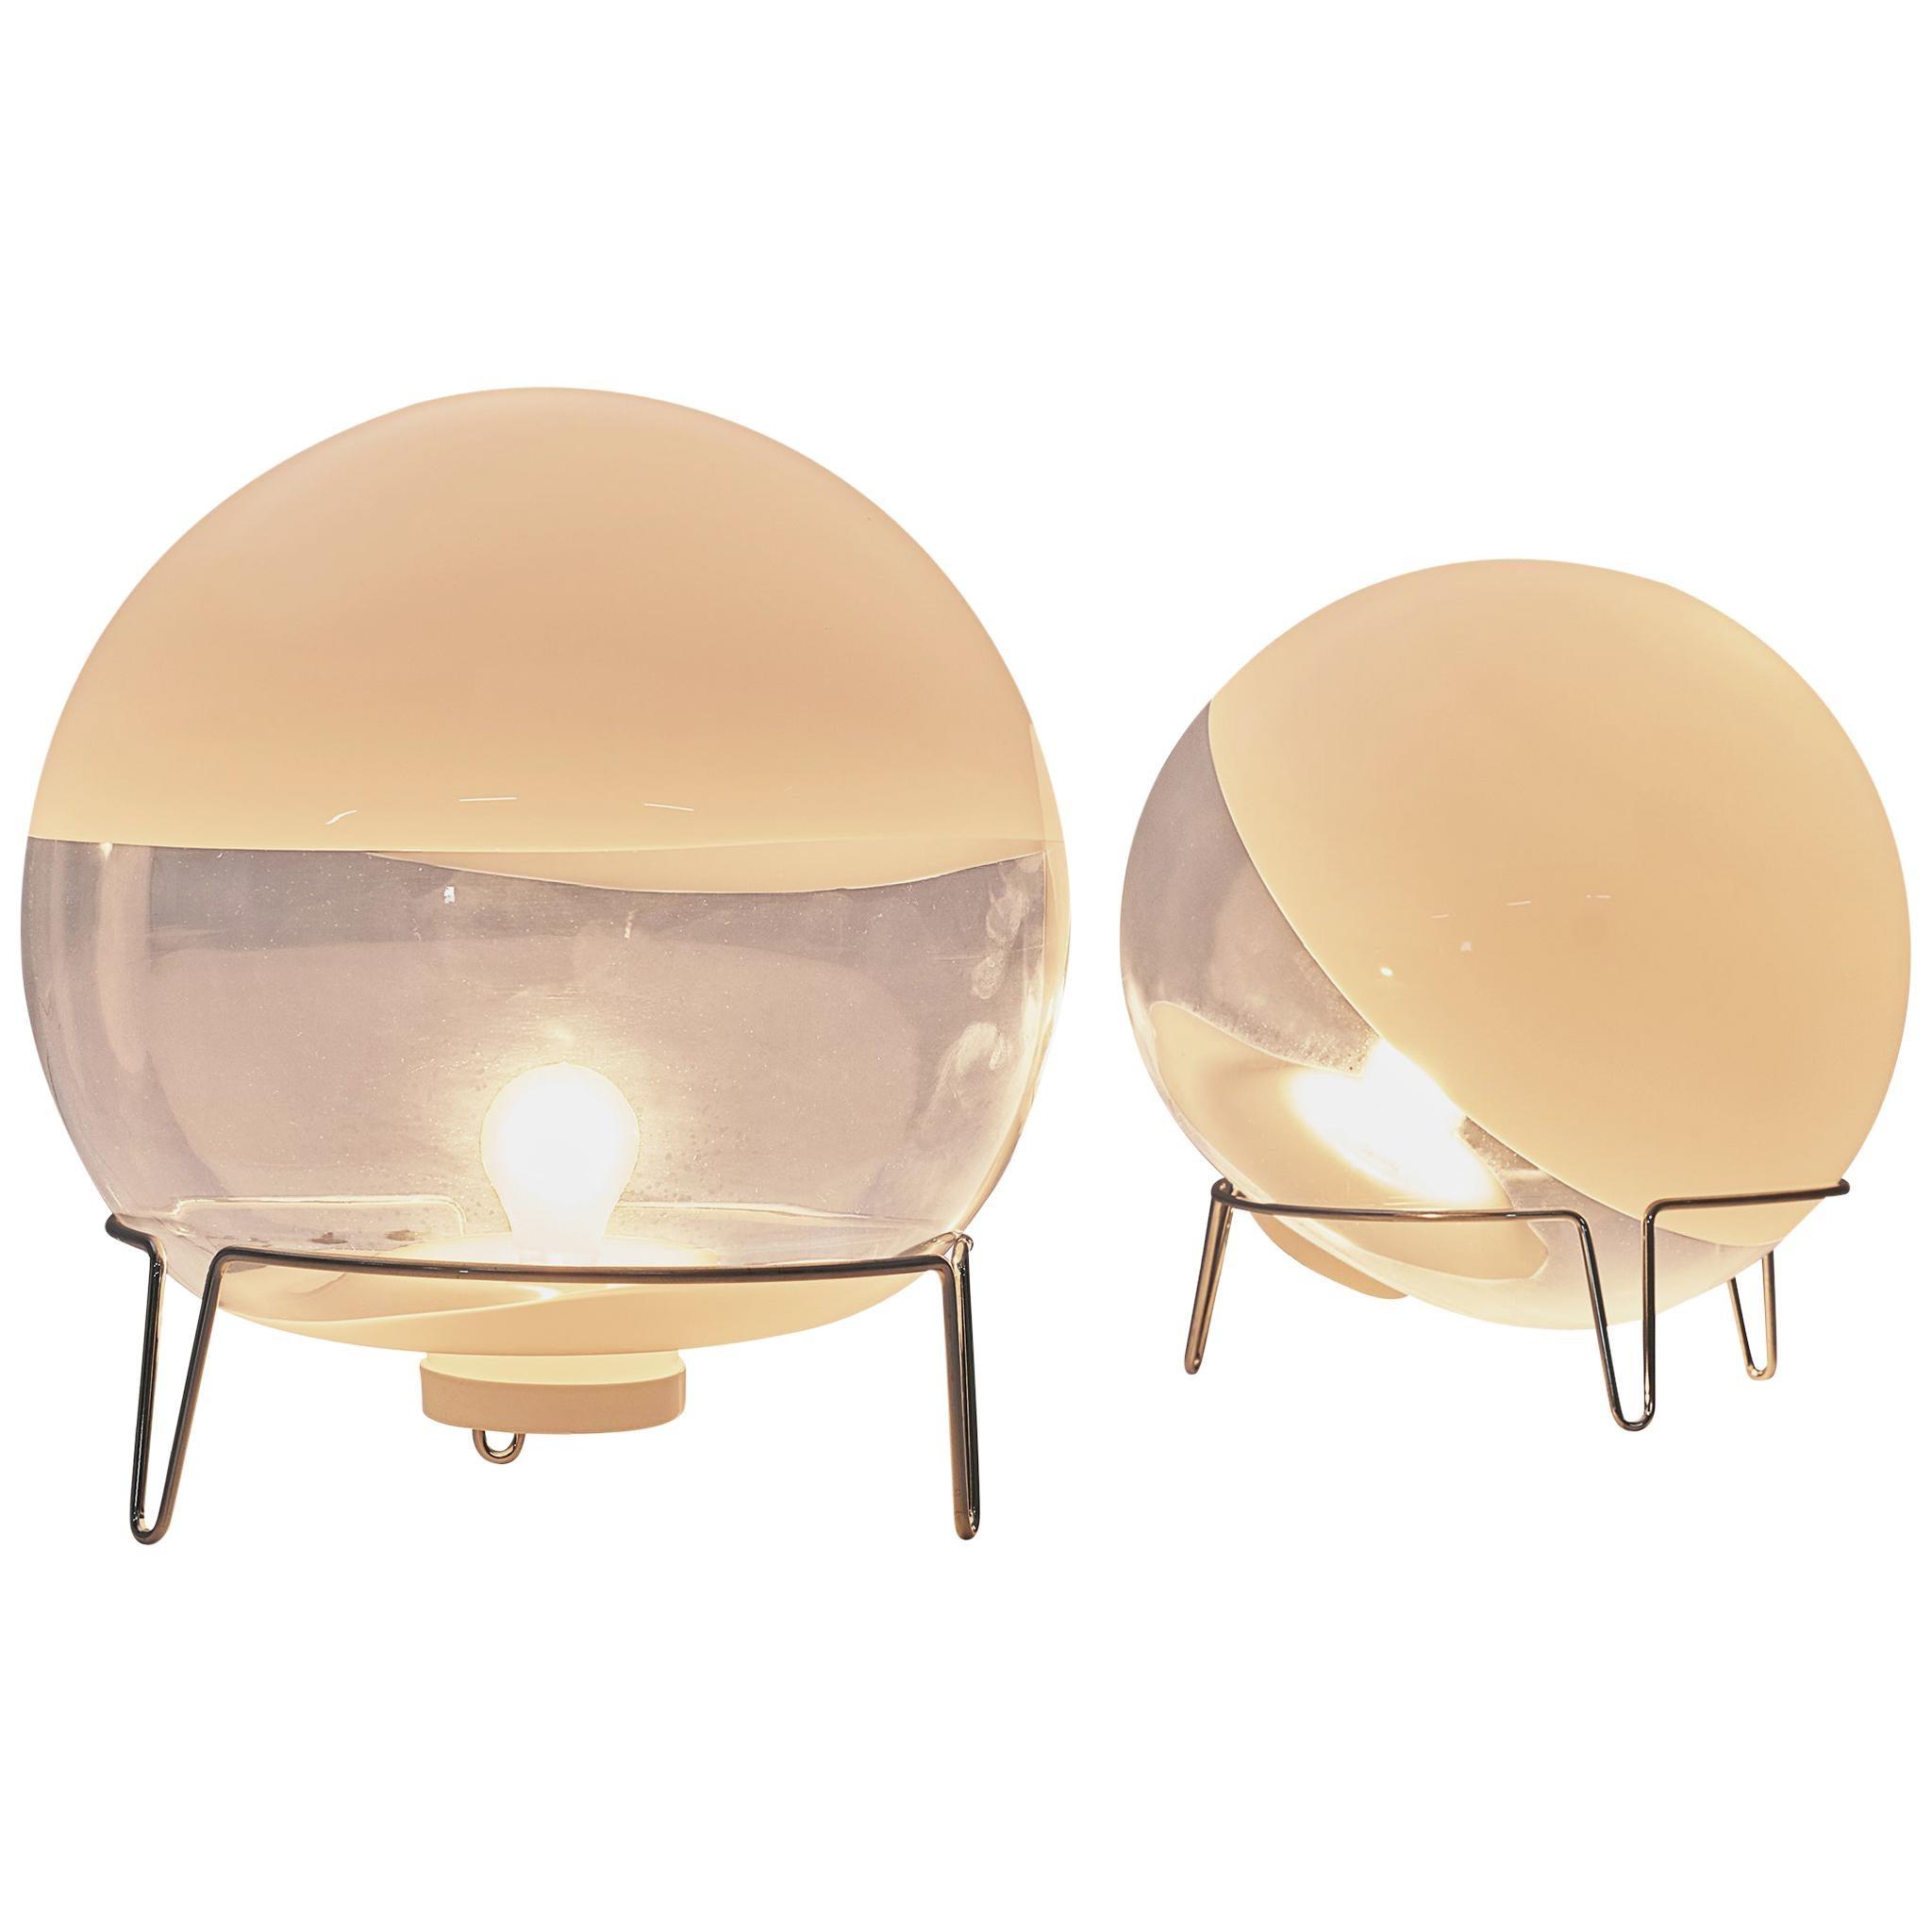 Angelo Mangiarotti Table Lamp for Skipper